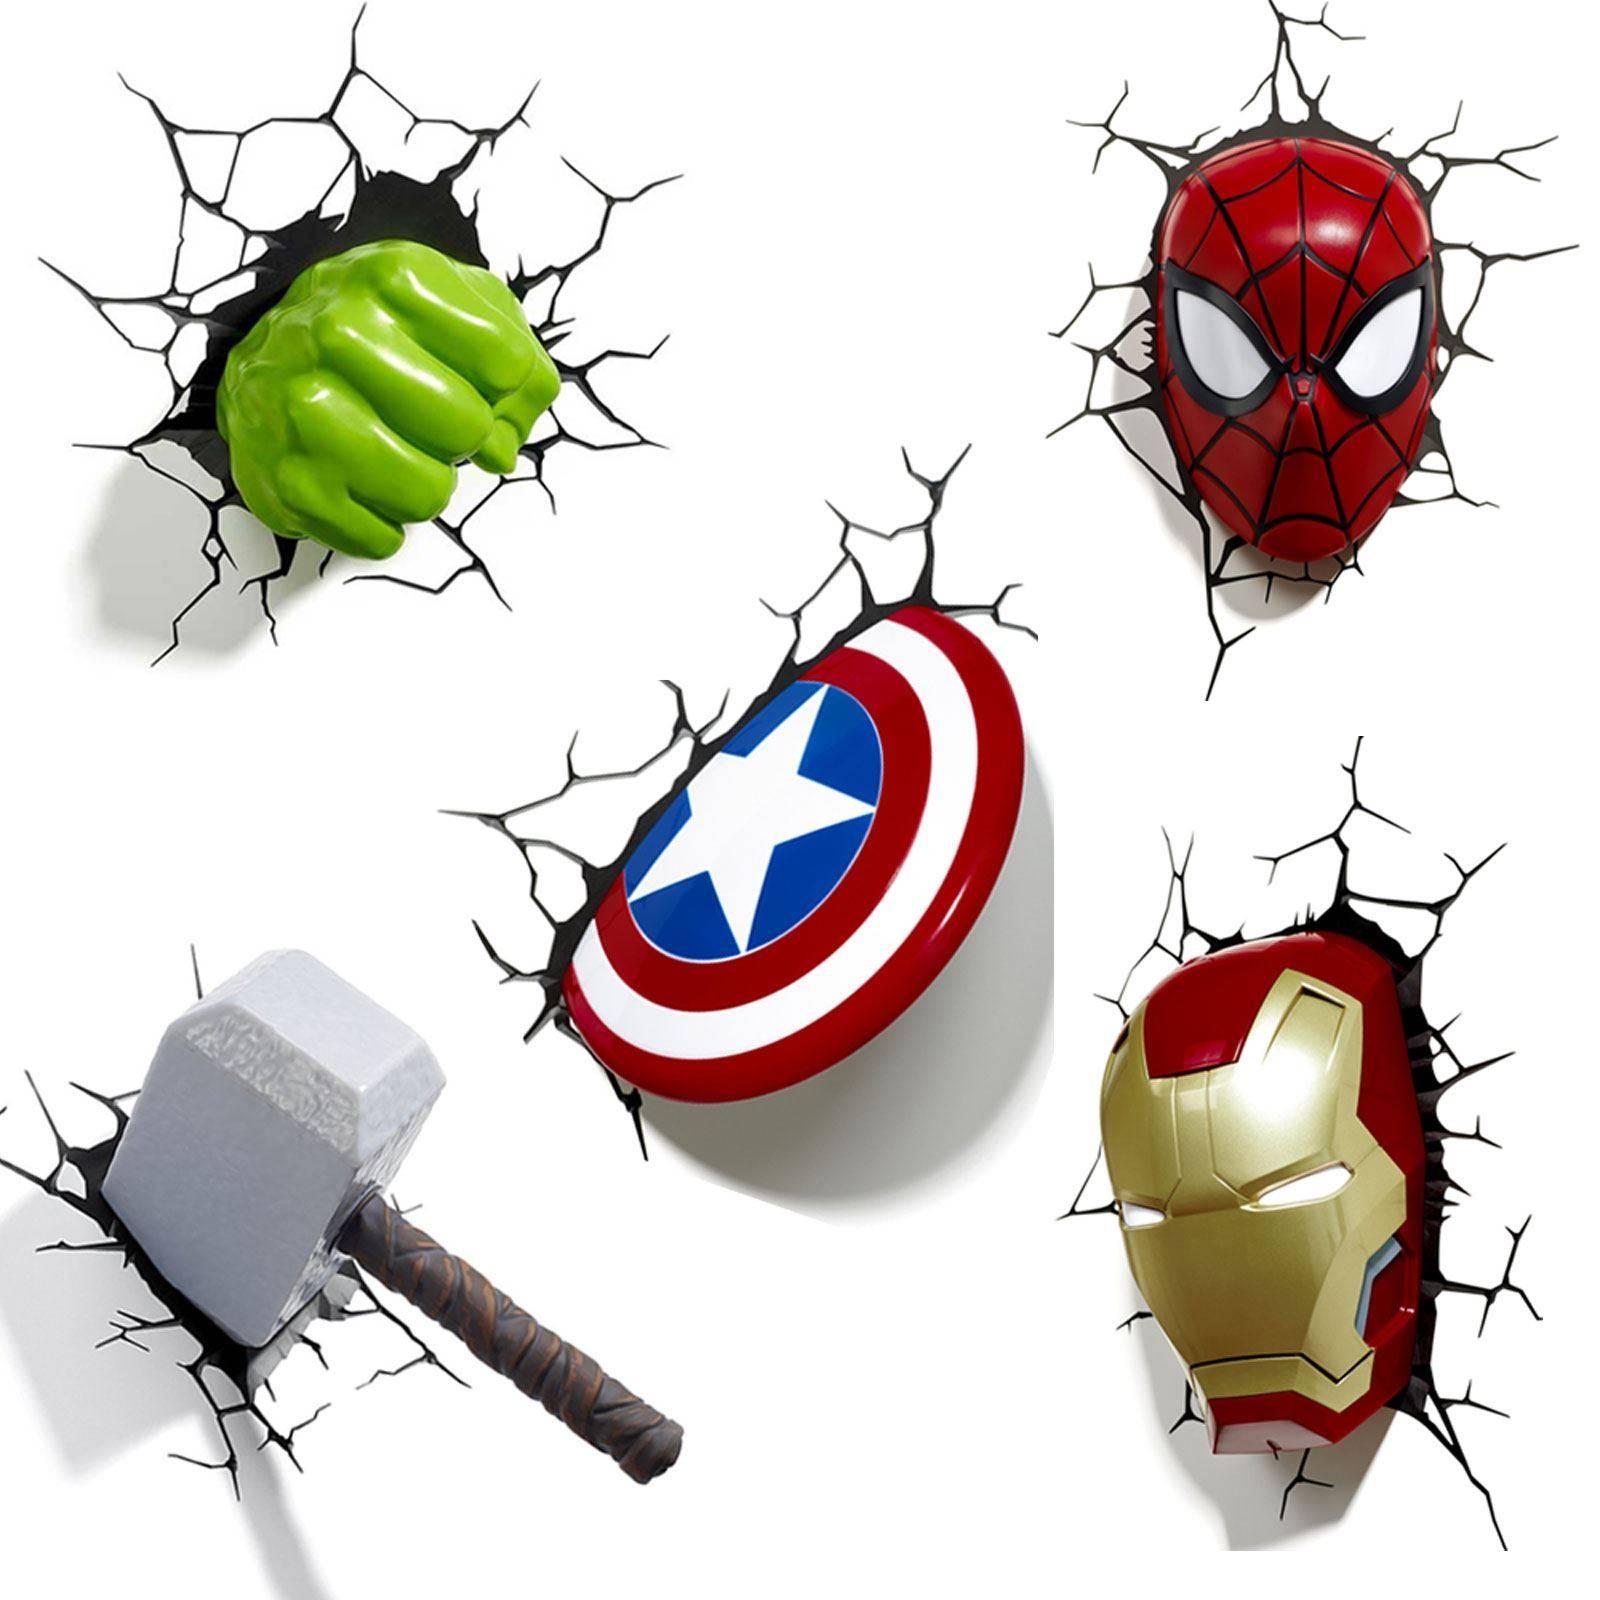 Marvel Avengers 3D Wall Light – Hulk, Iron Man, Captain America With Regard To 2017 Captain America 3D Wall Art (View 17 of 20)